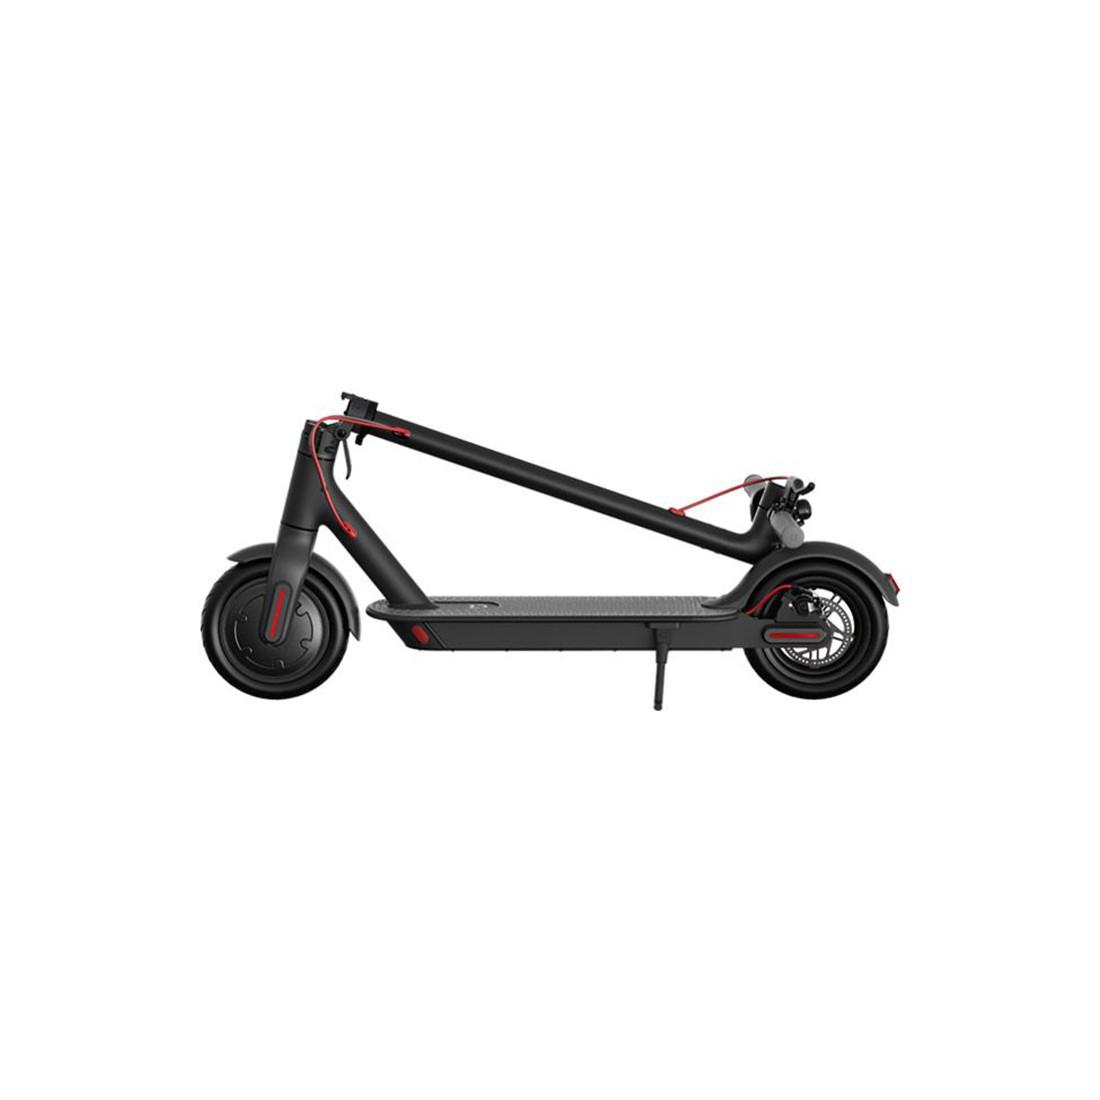 Электросамокат Xiaomi MiJia Smart Electric Scooter 1S - фото 1